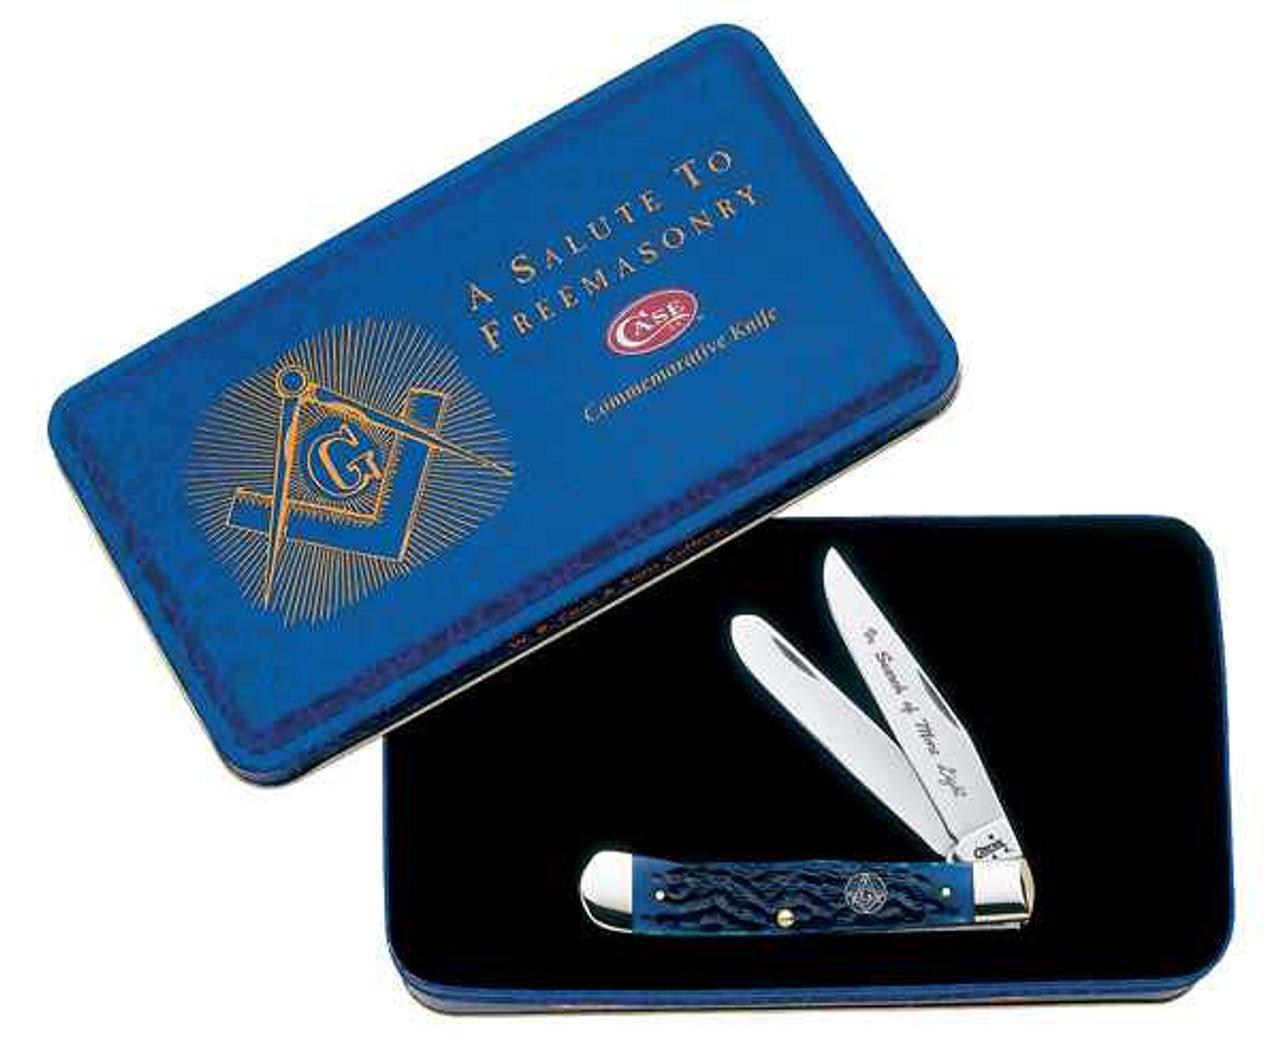 Case 1058 Masonic Trapper Gift Set, Jigged Blue Bone Handle (6254 SS)